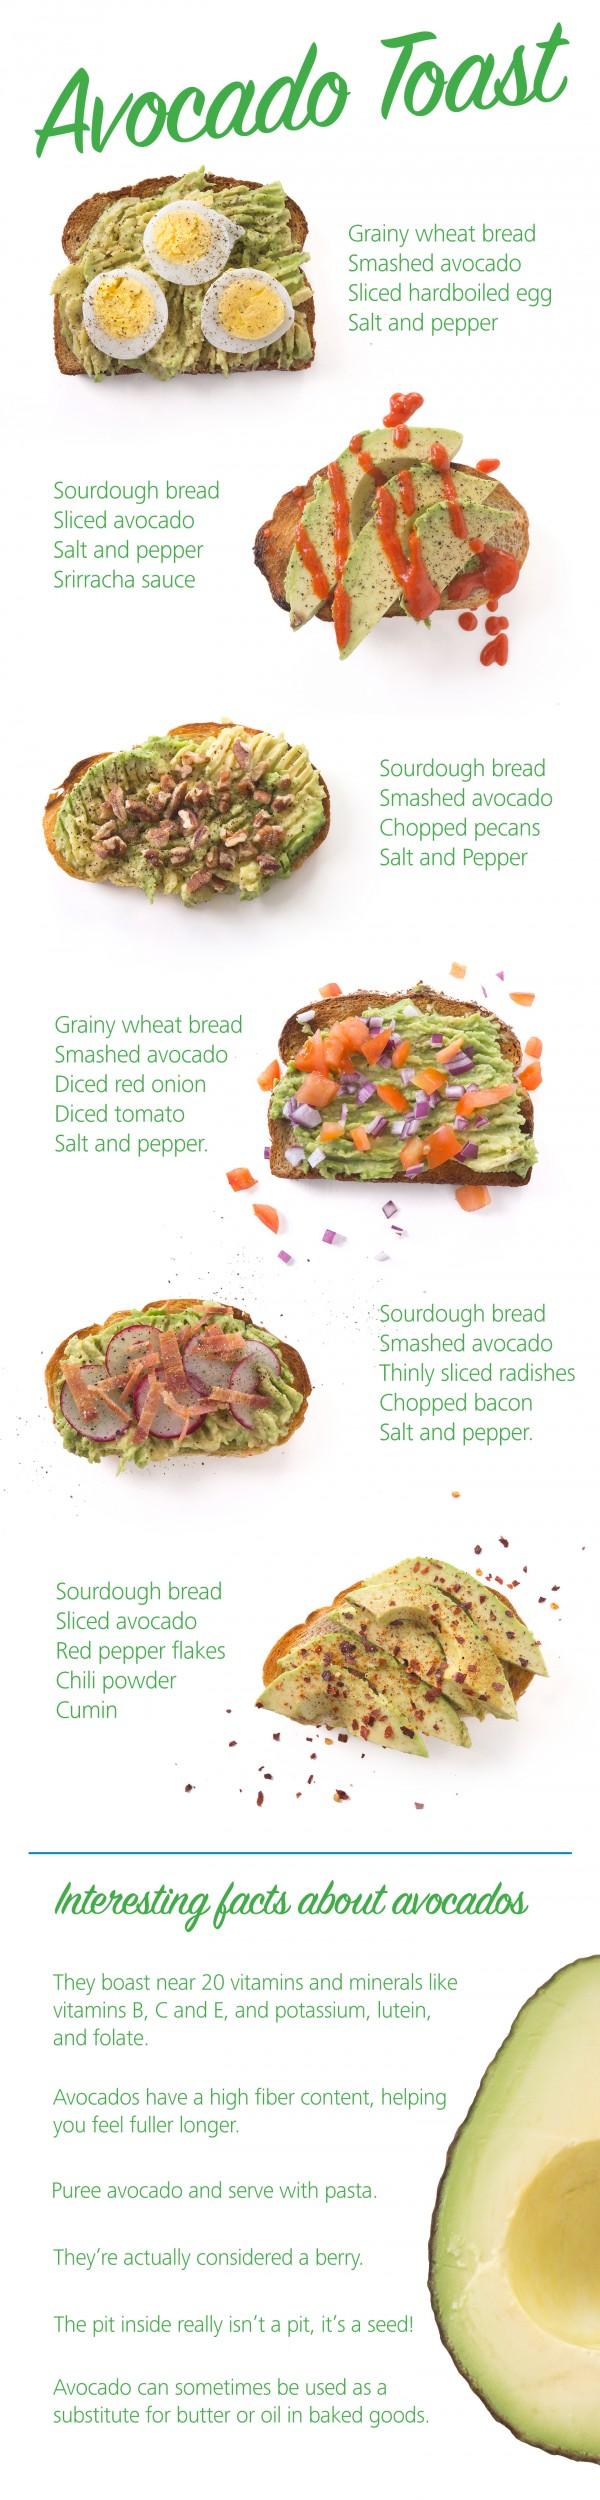 avocado-toast-1-graphic